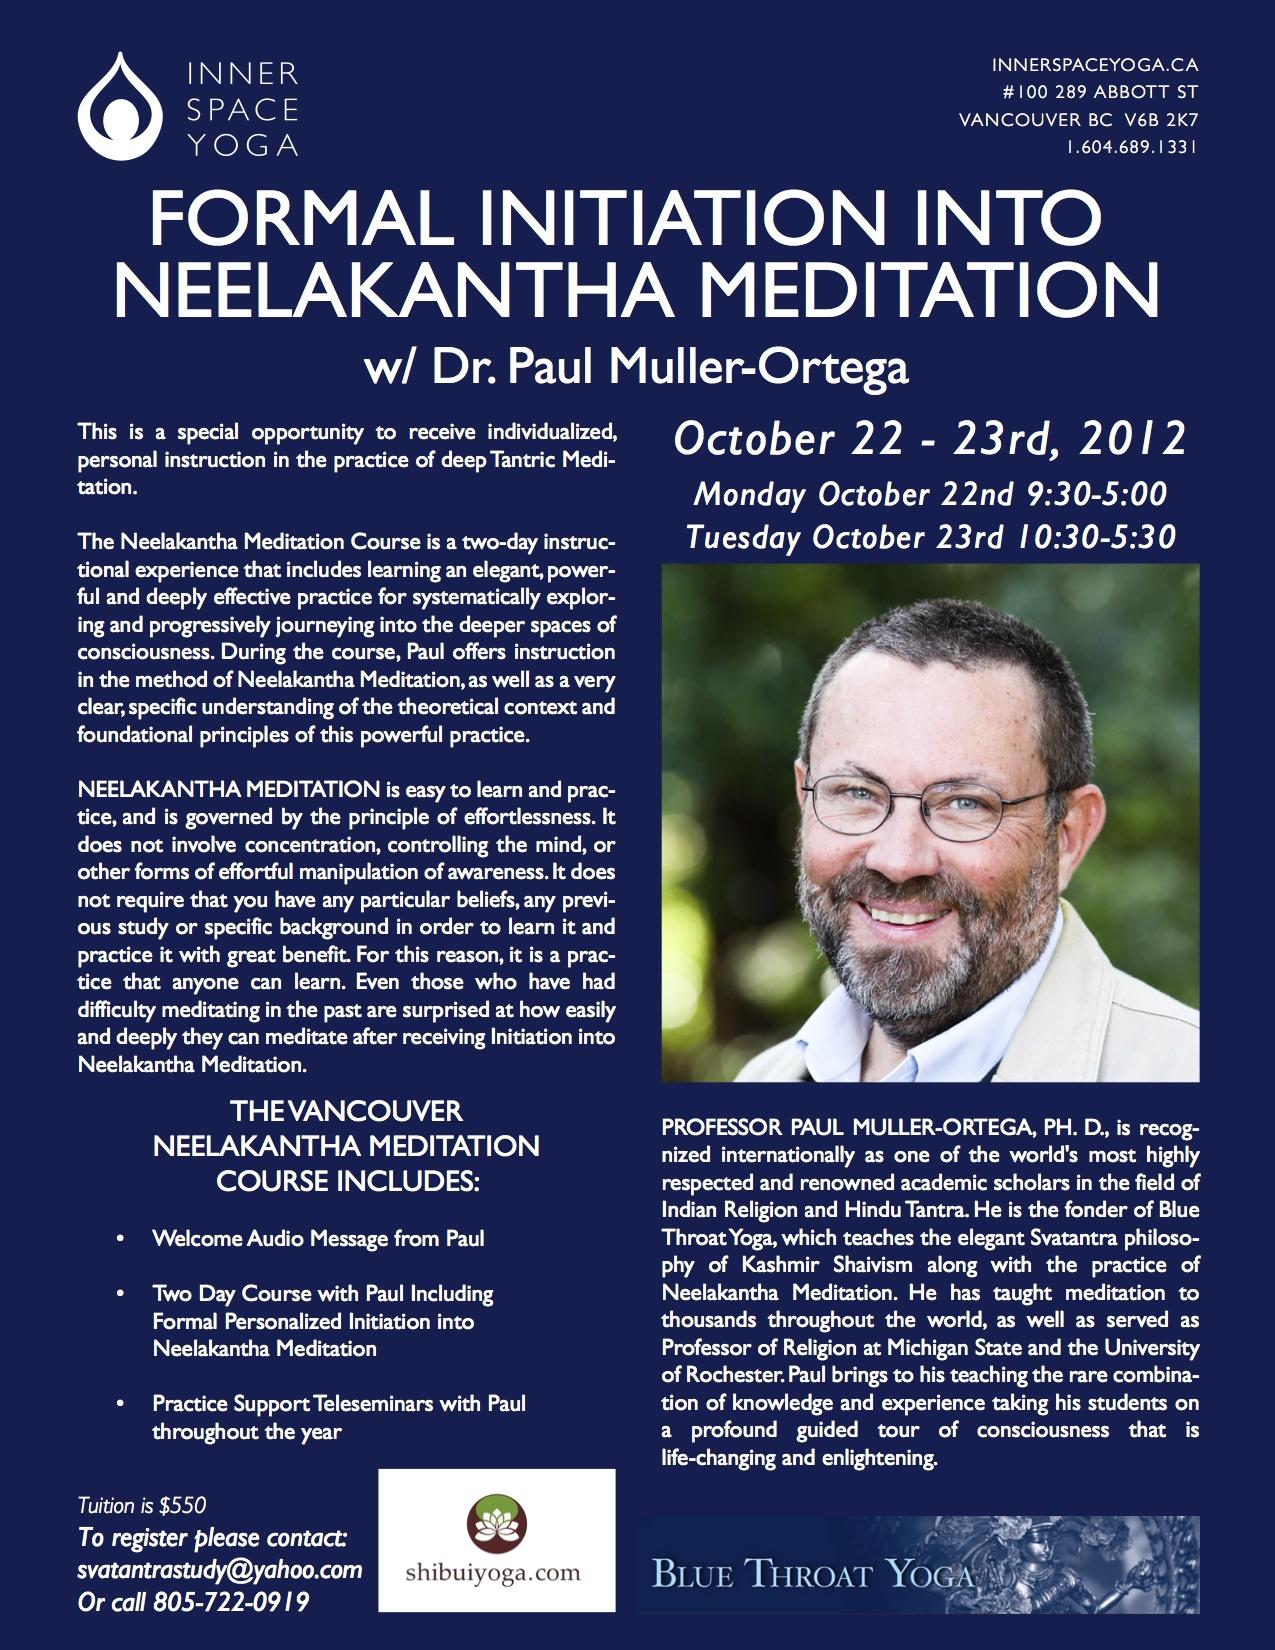 Neelankantha Meditation Initiation in Vancouver